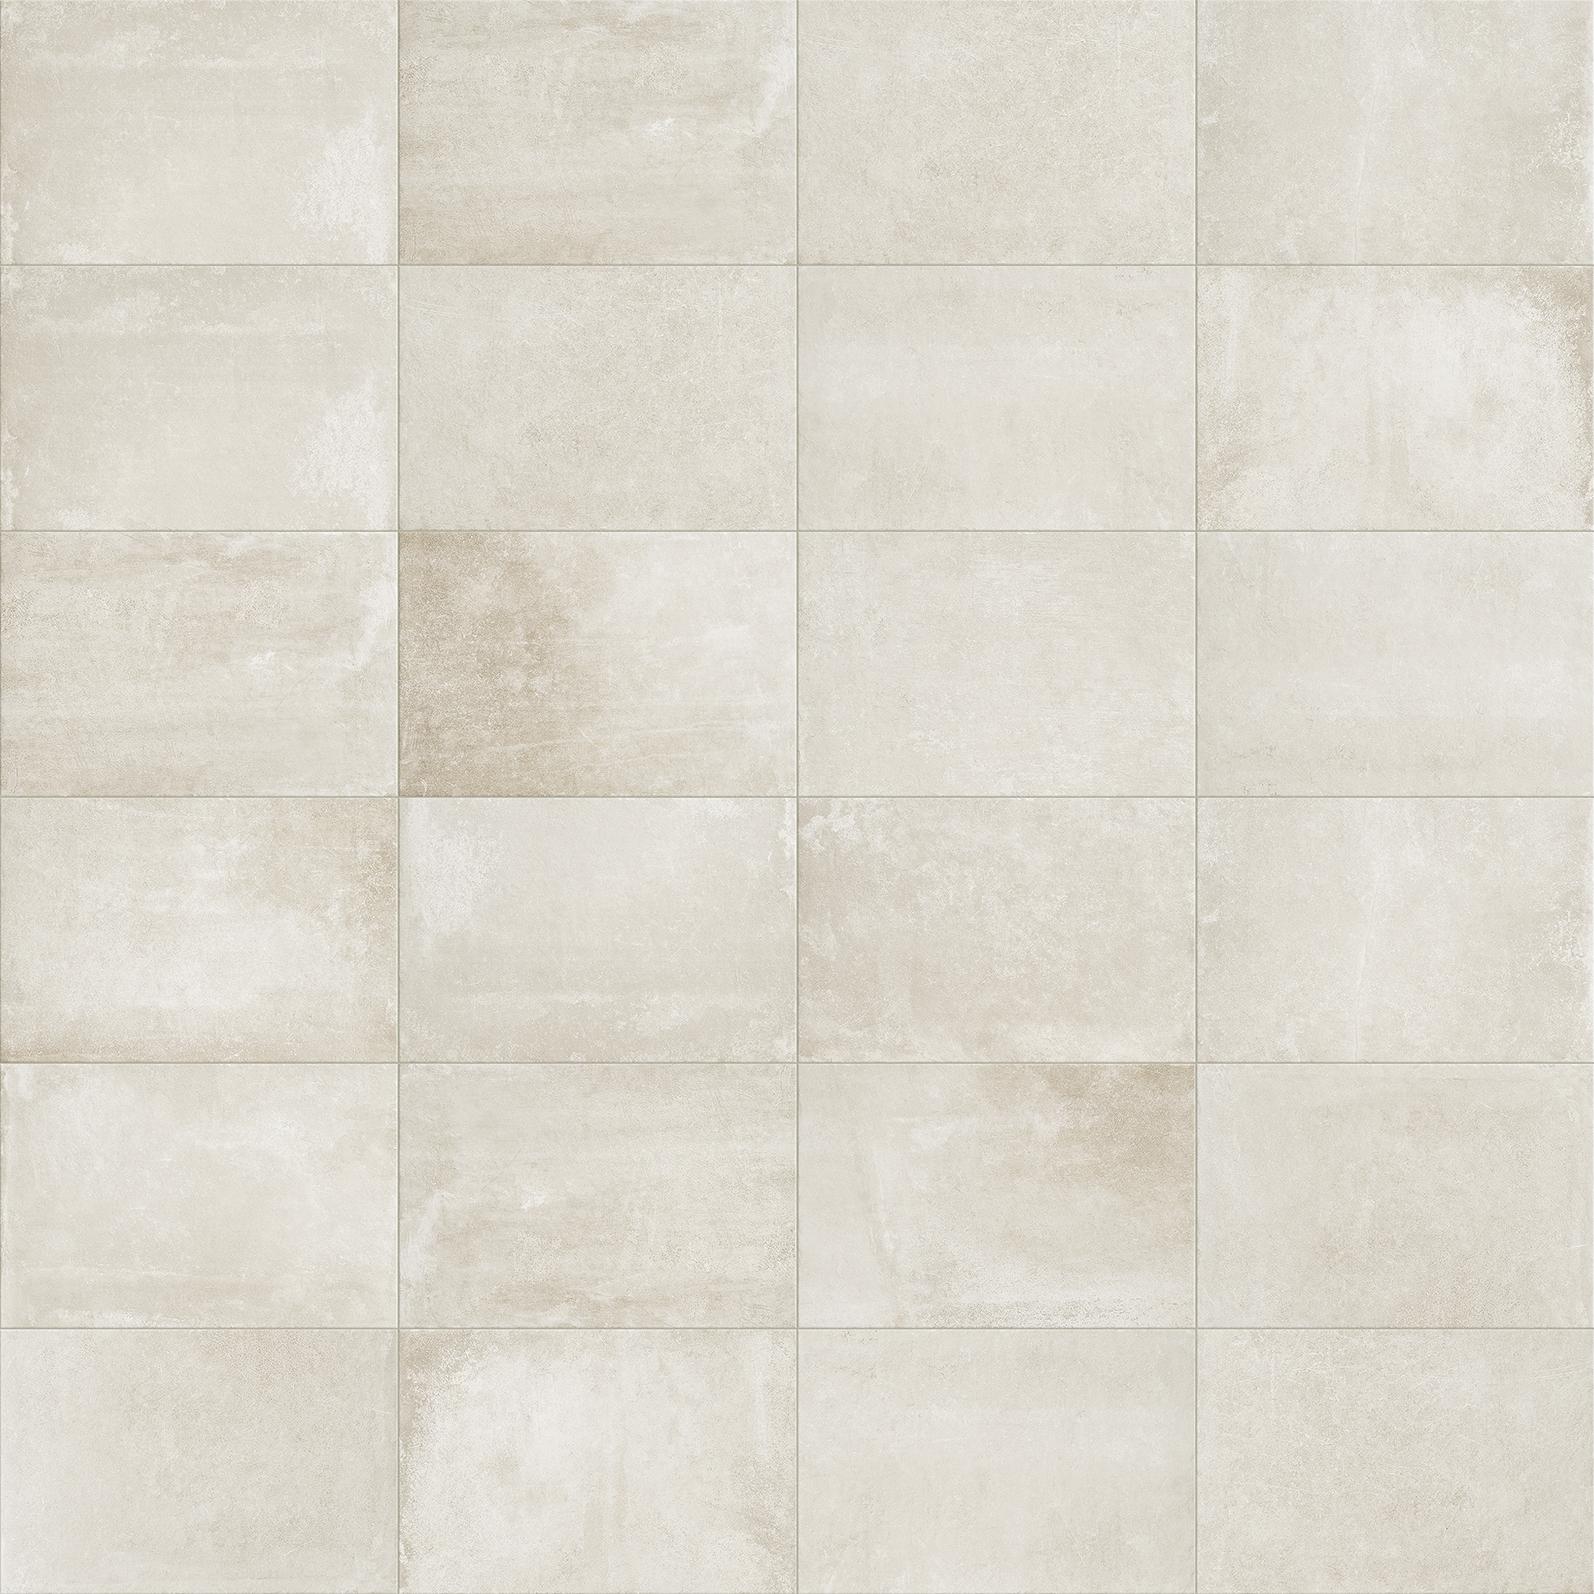 opus stone avorio rustic stone effect porcelain tile studio tiles